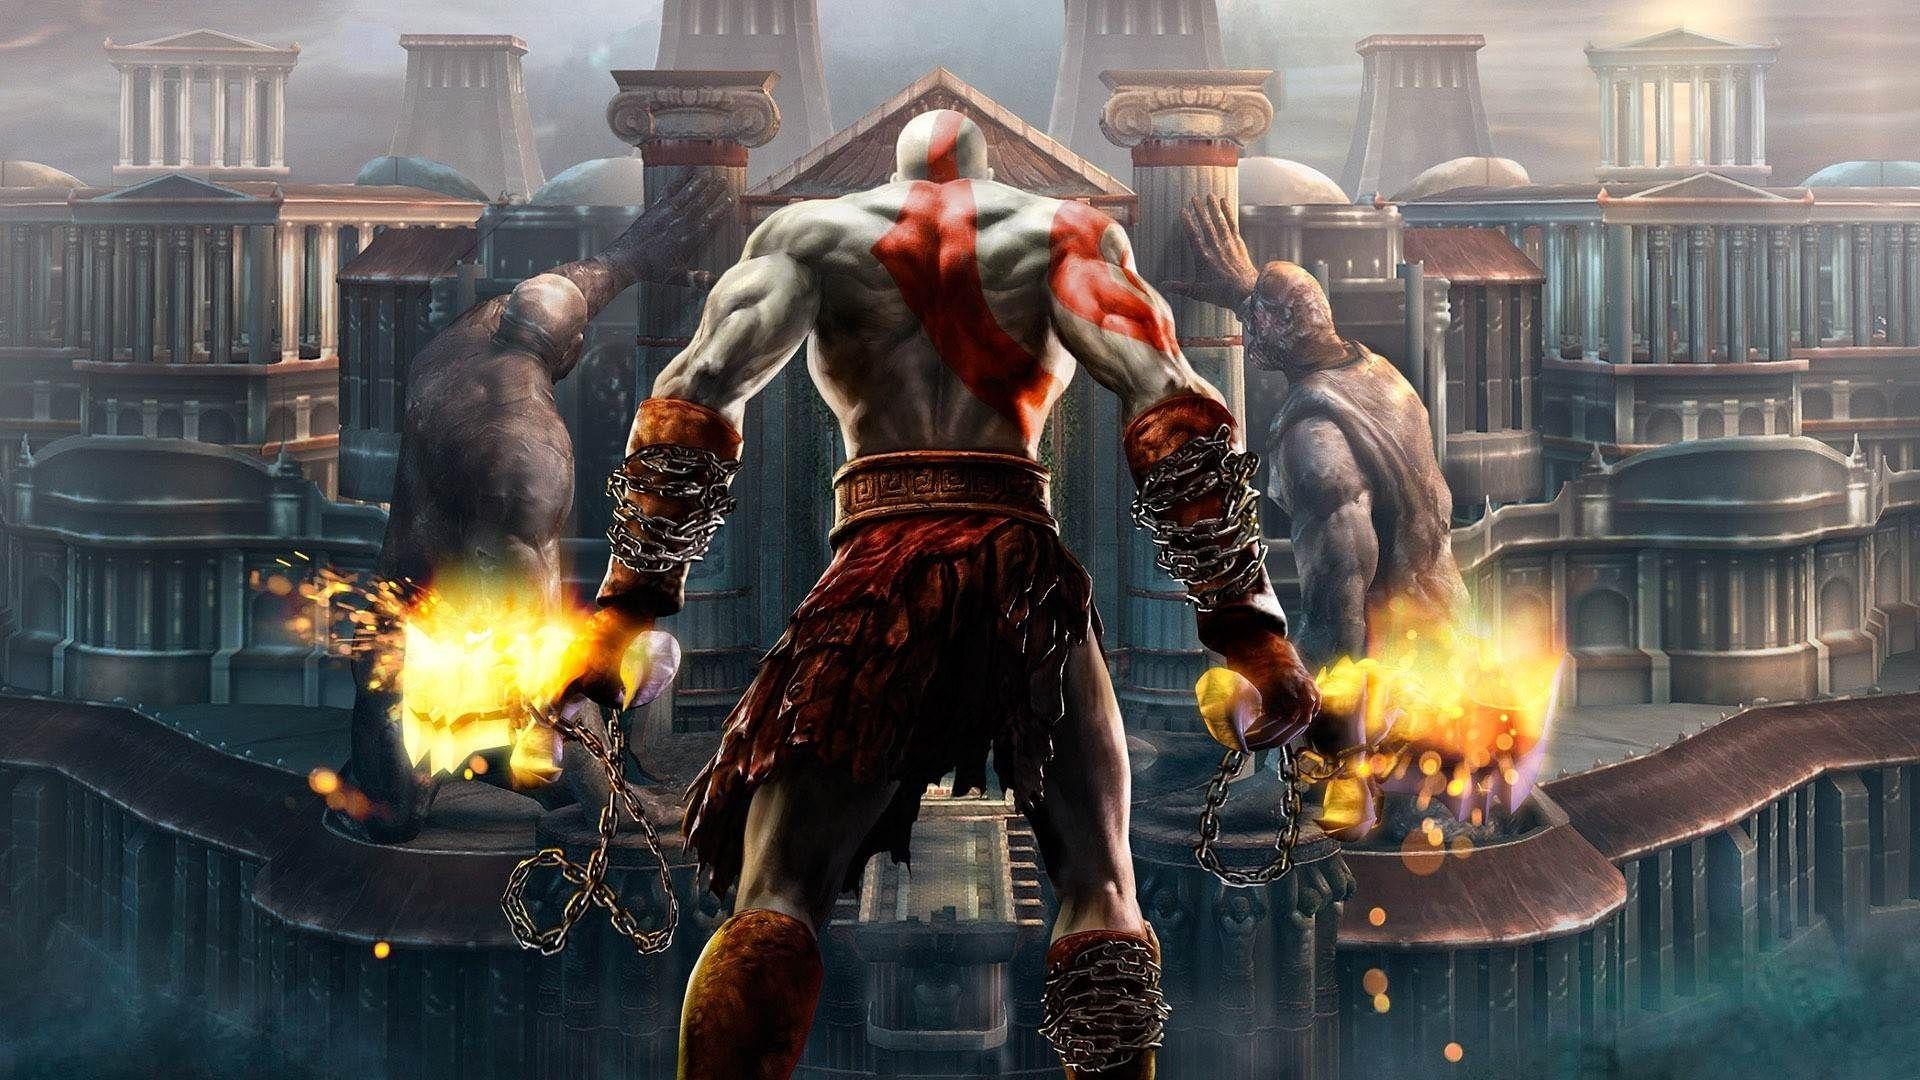 kratos wallpaper full hd 1920—1080 Kratos HD Wallpapers